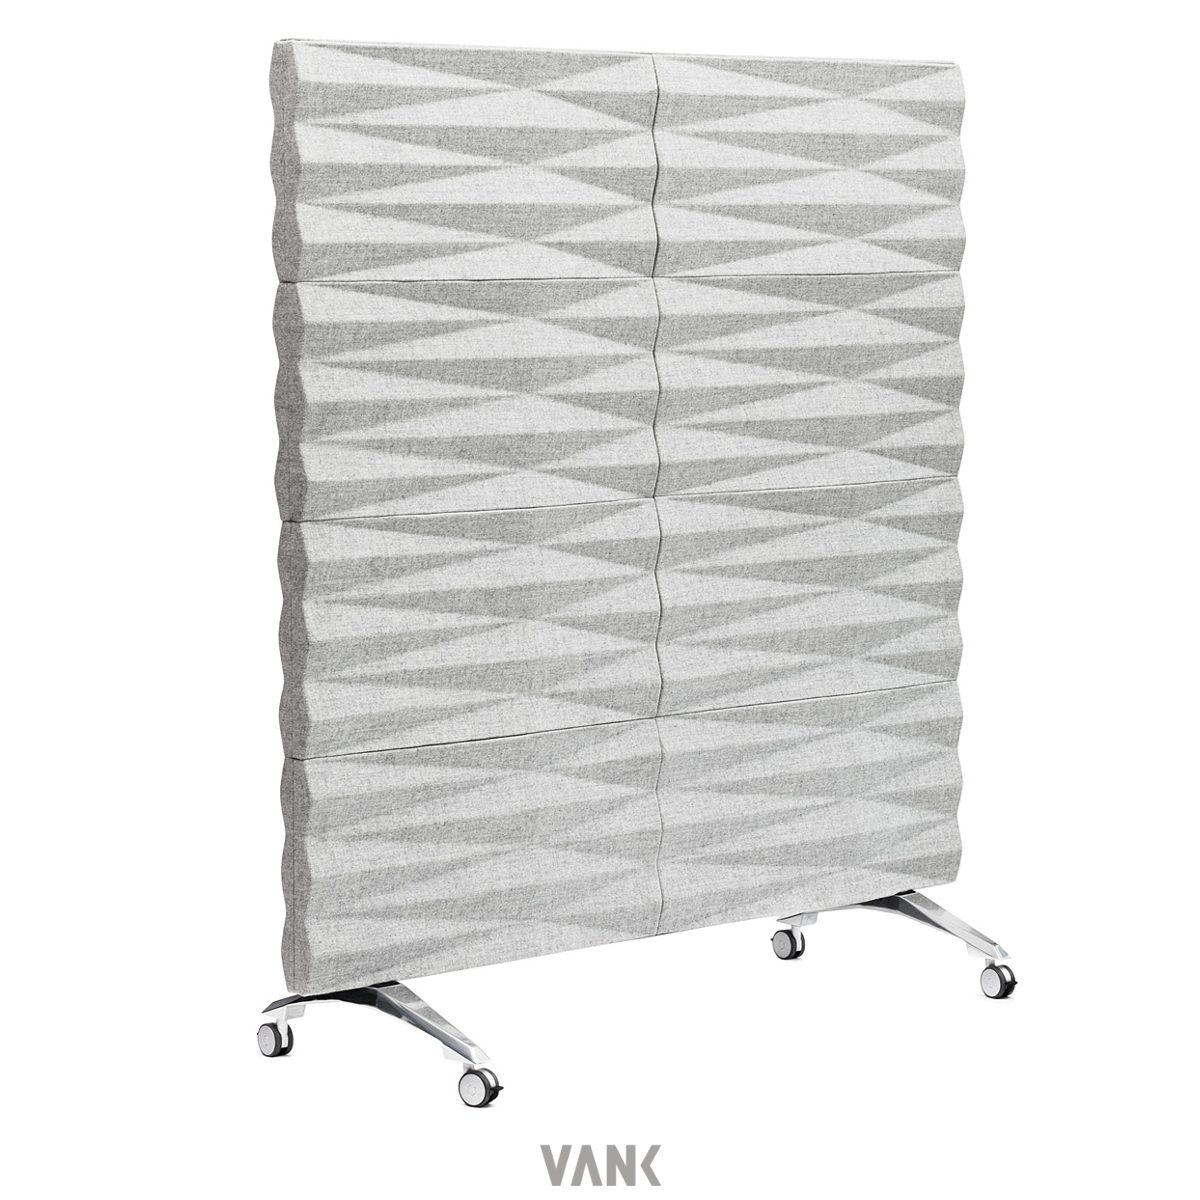 VANK-wall (2)